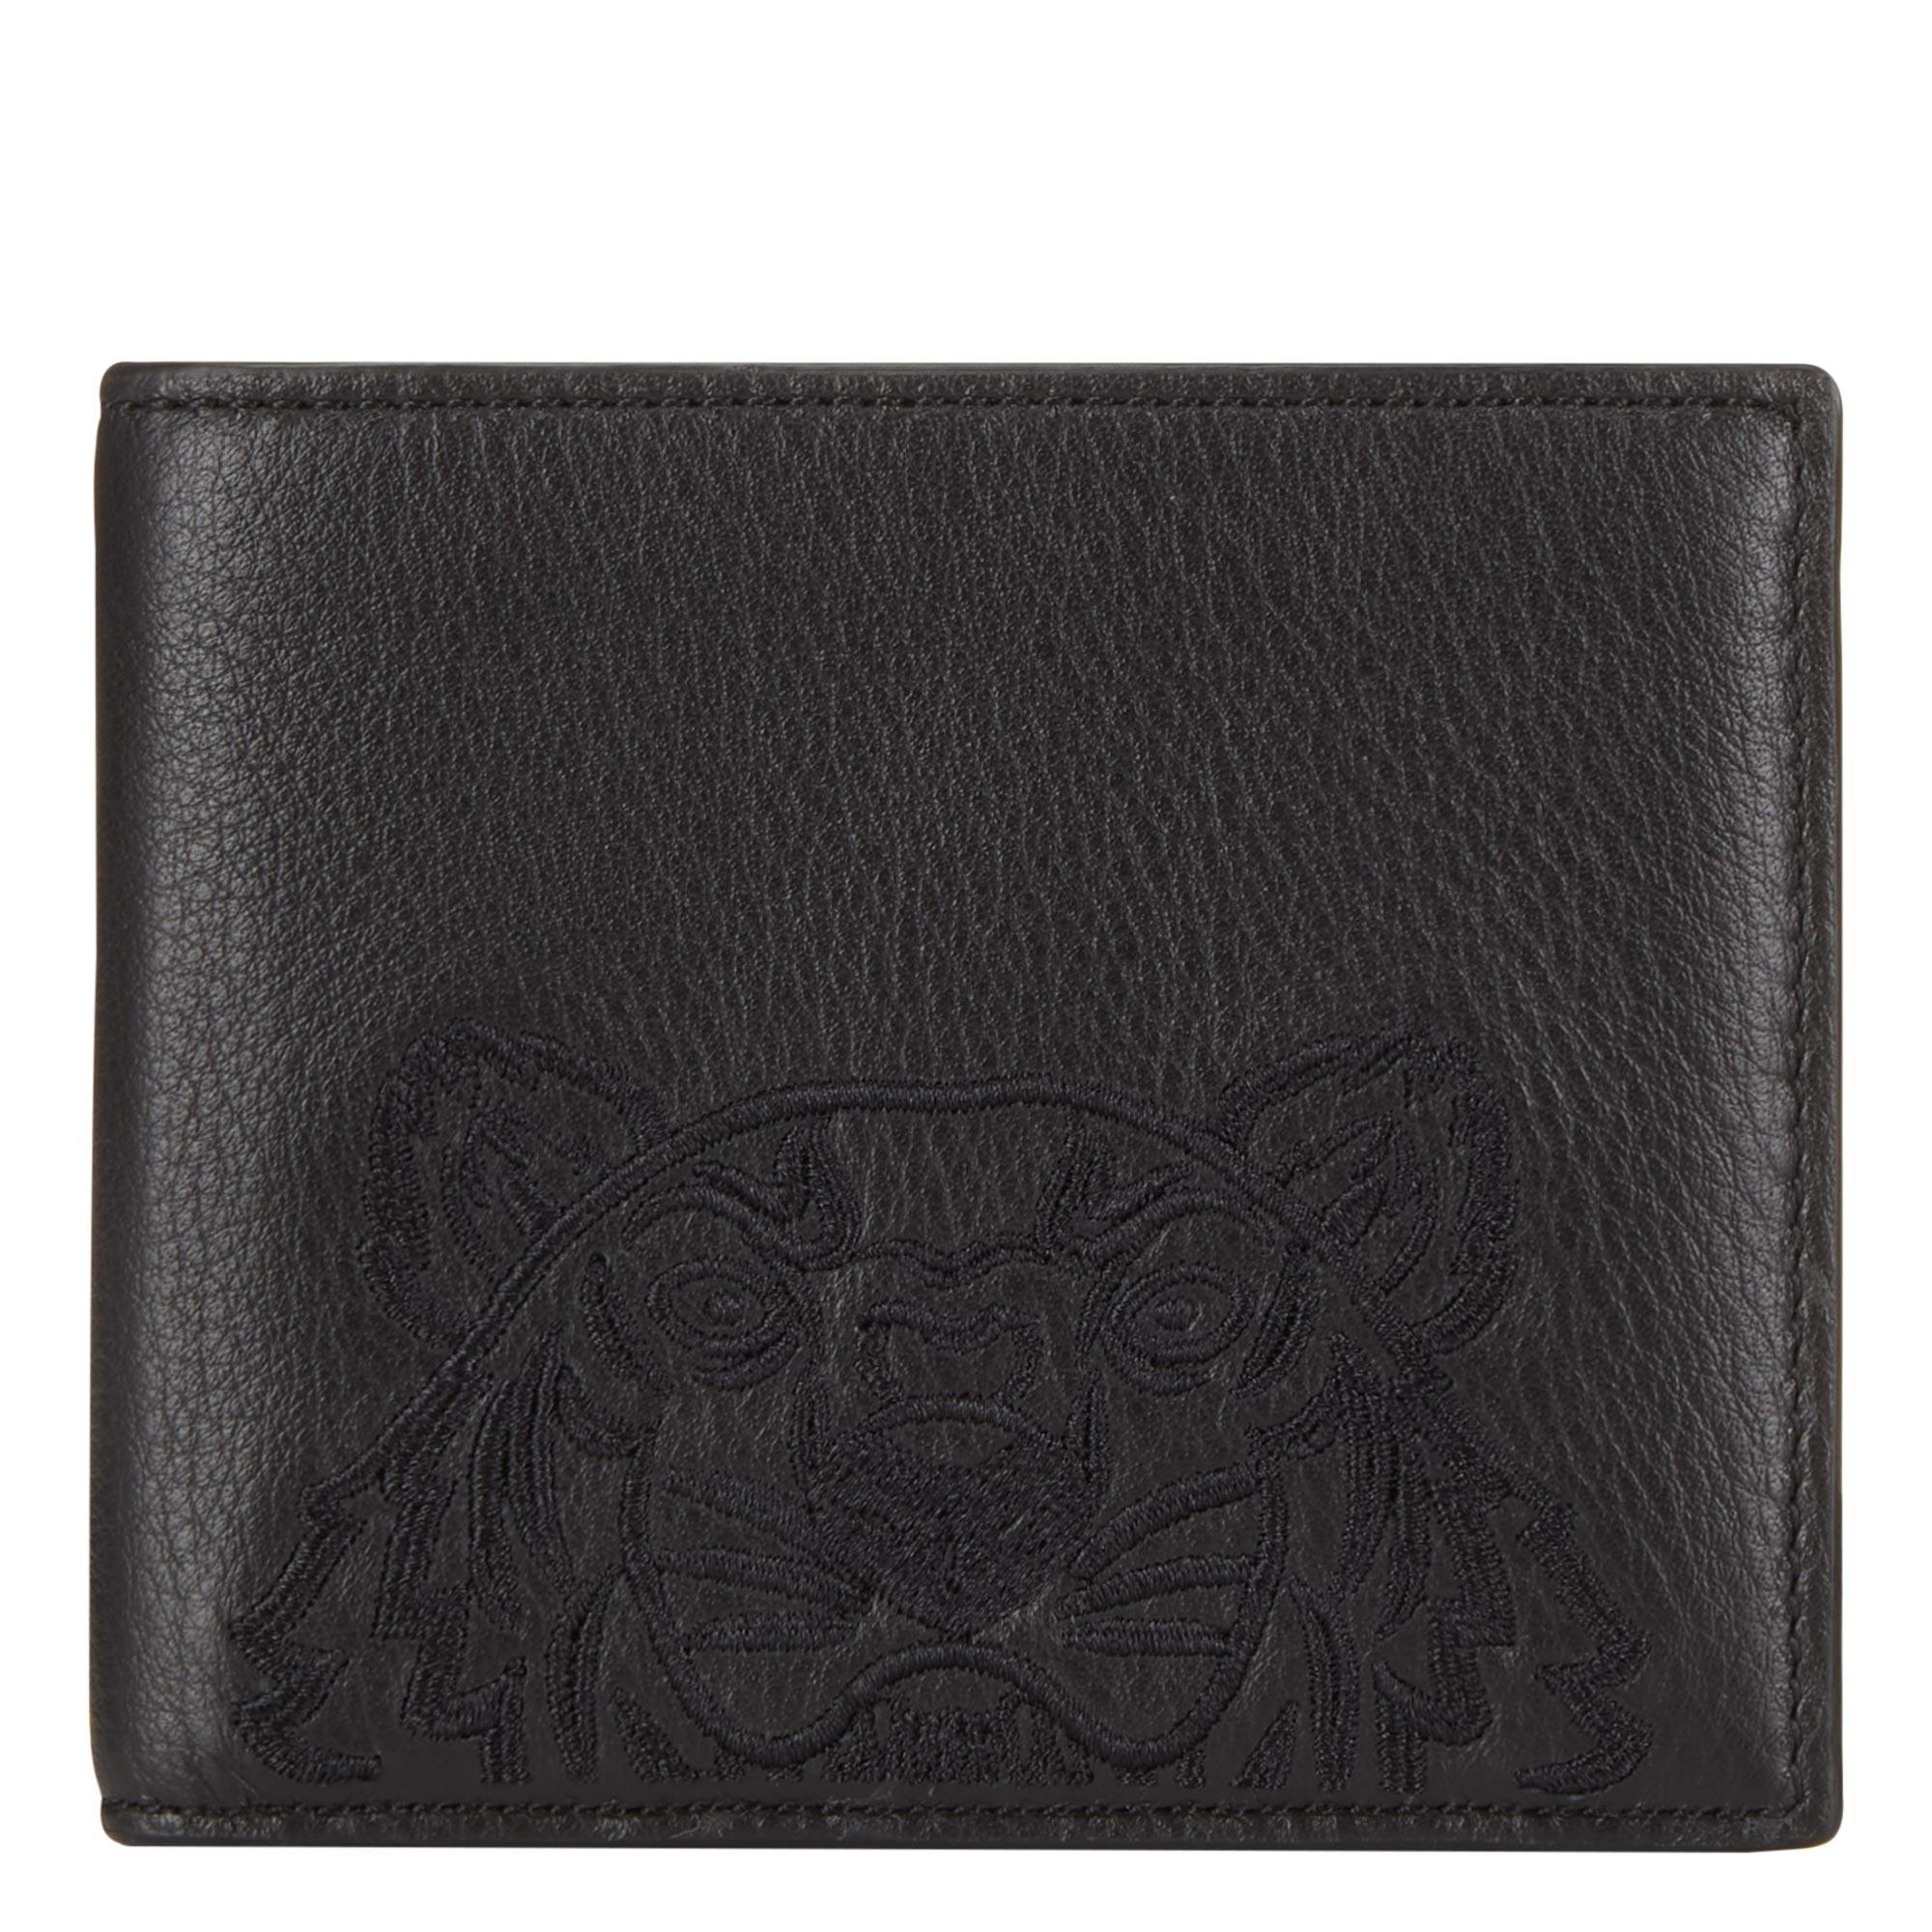 Kampus Leather Wallet